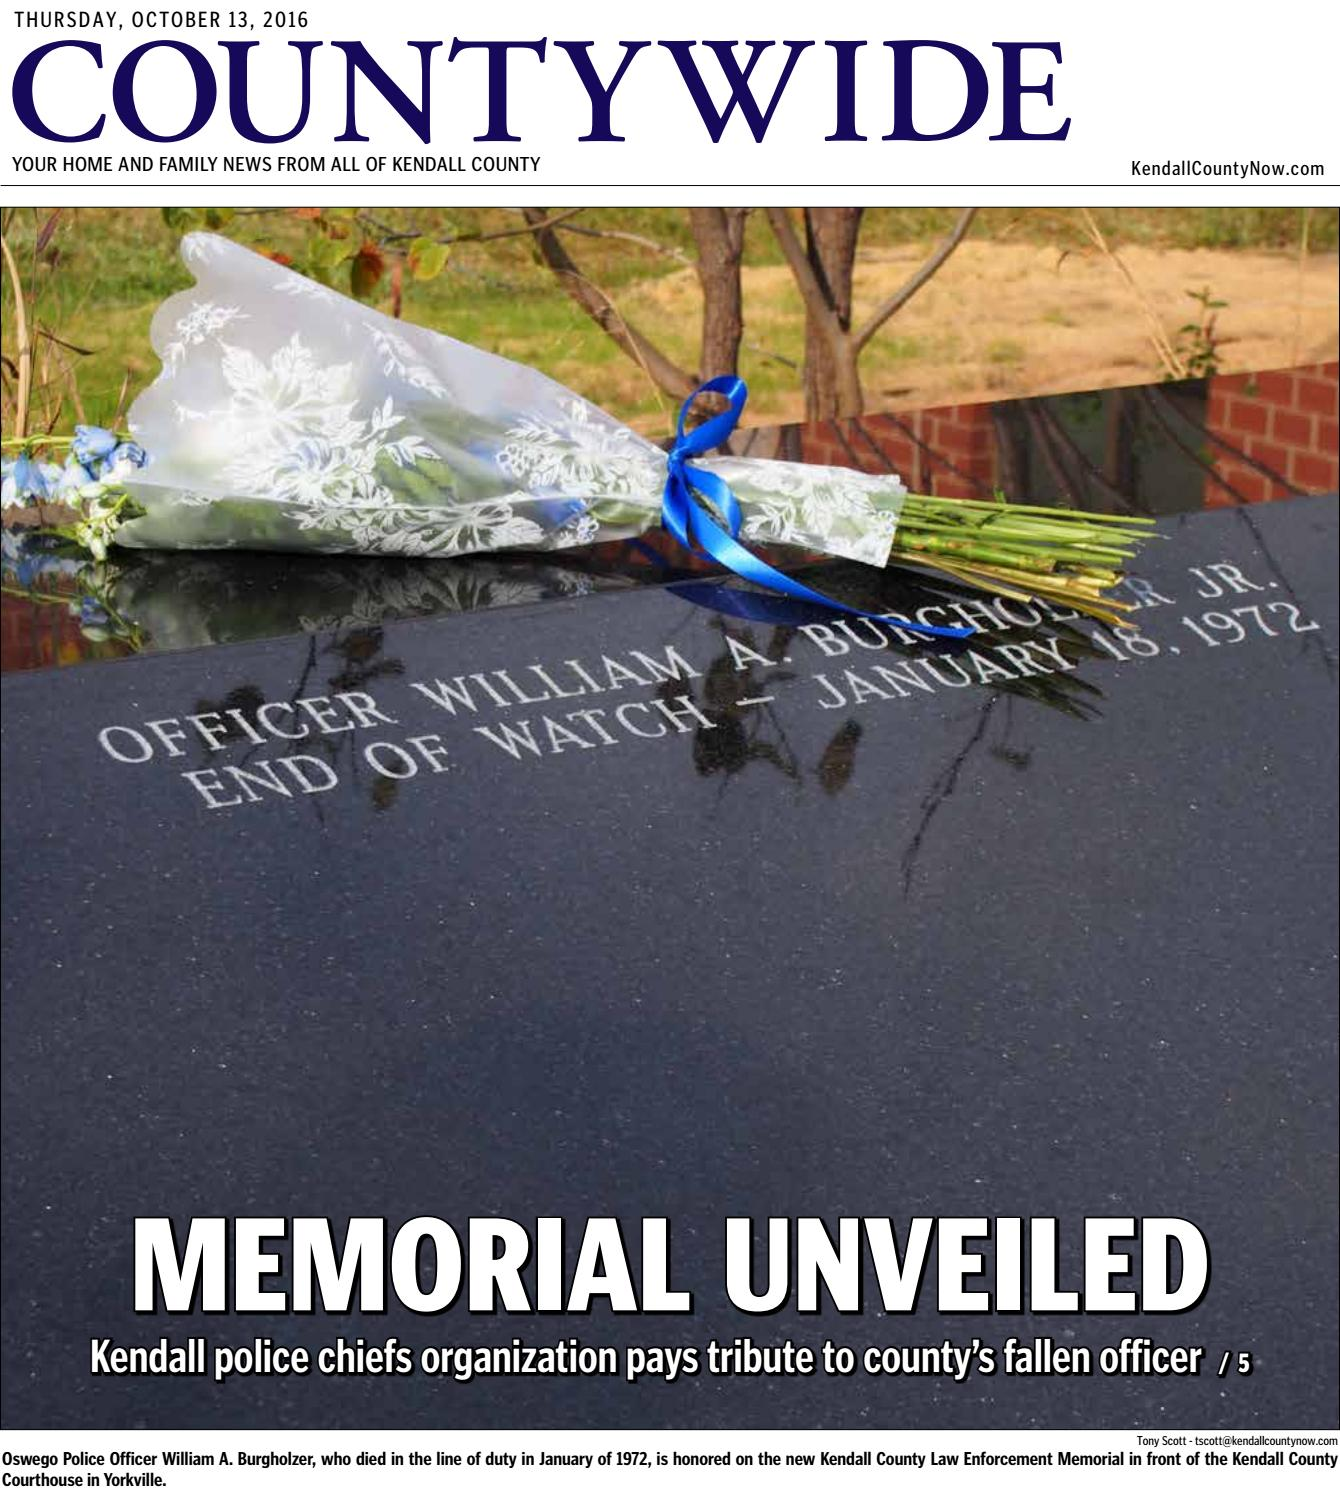 Illinois kendall county oswego - Illinois Kendall County Oswego 21